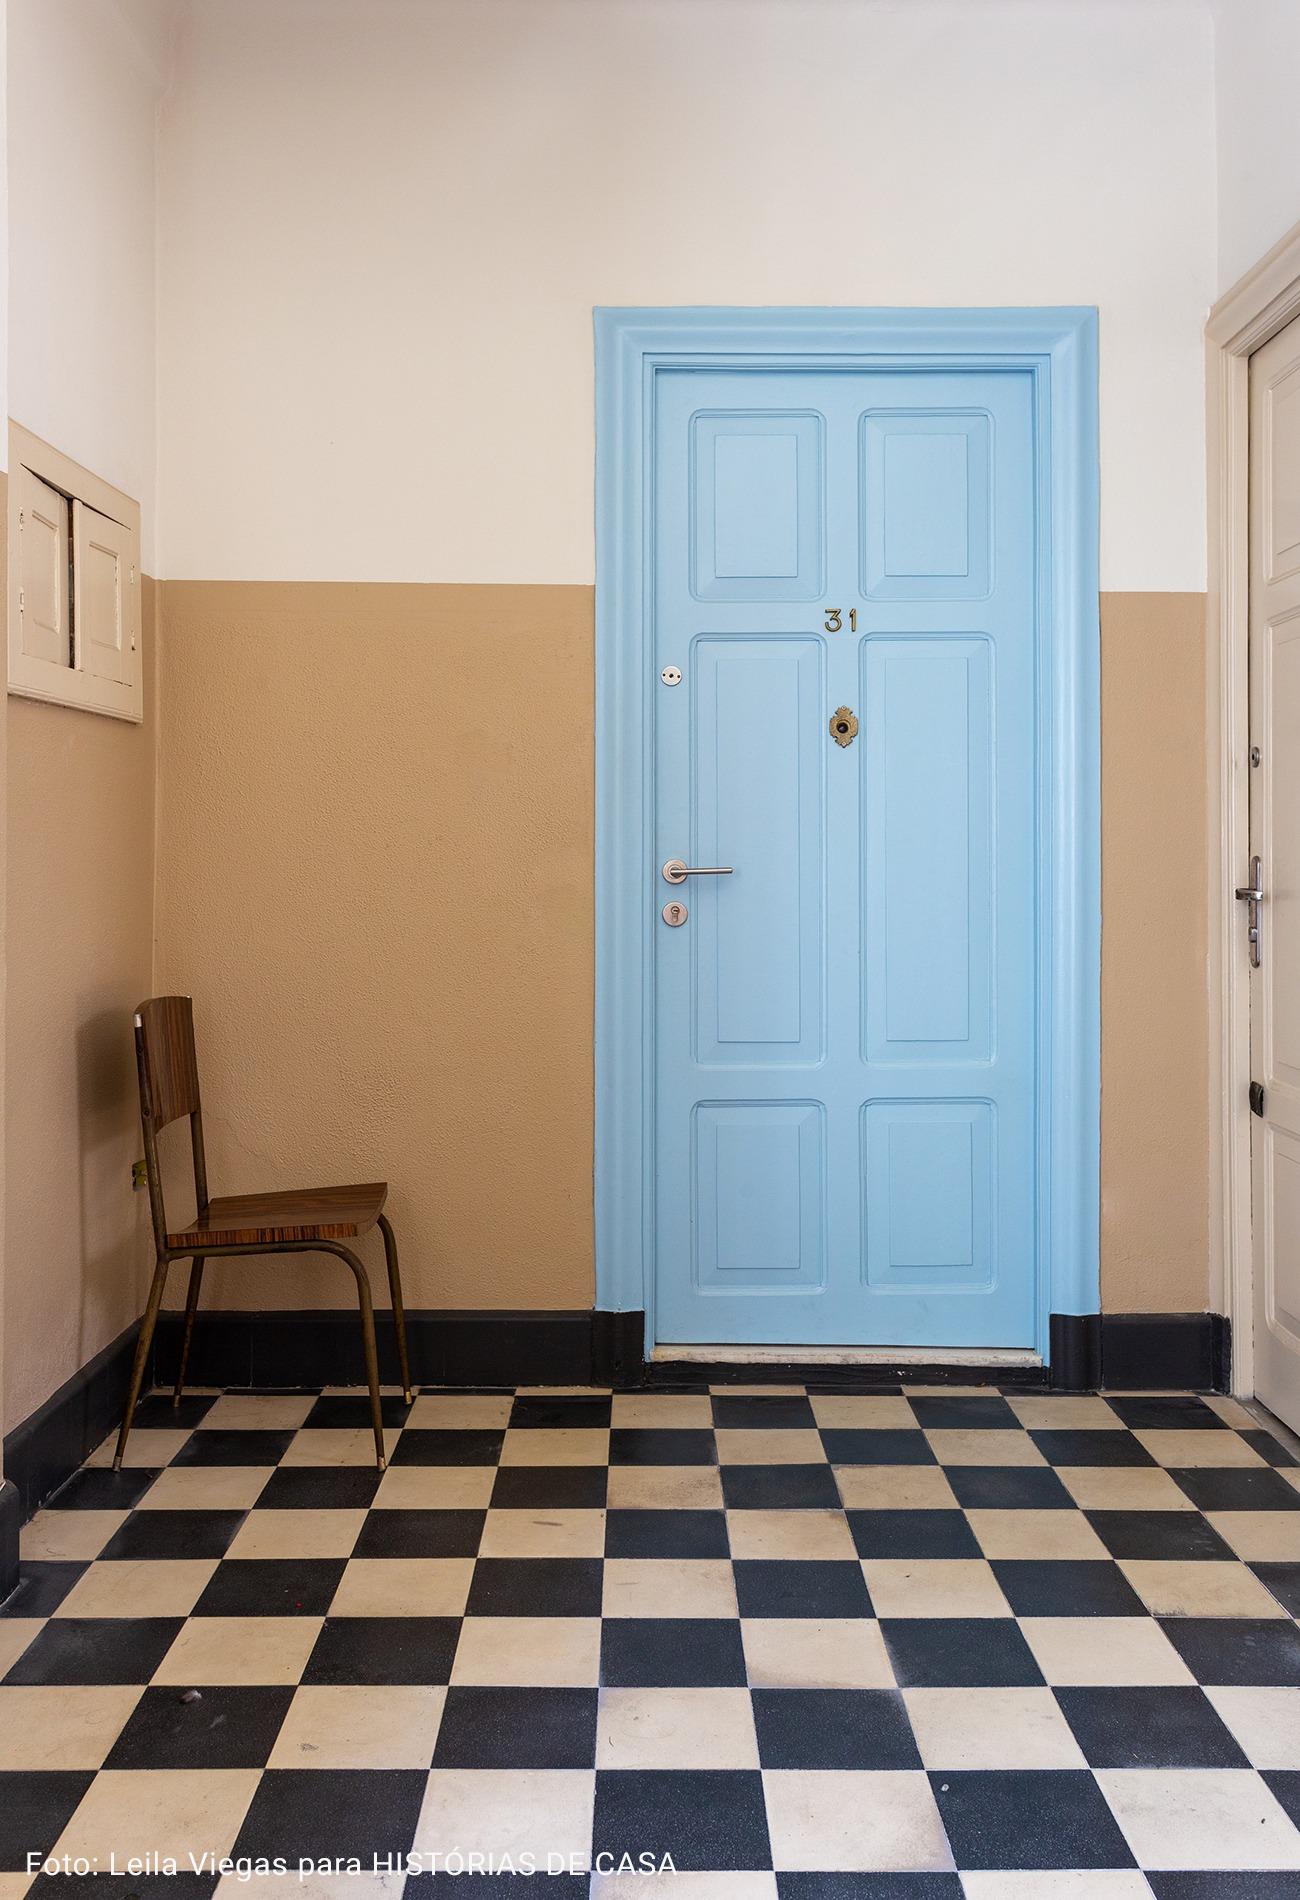 entrada de apartamento com piso xadrez